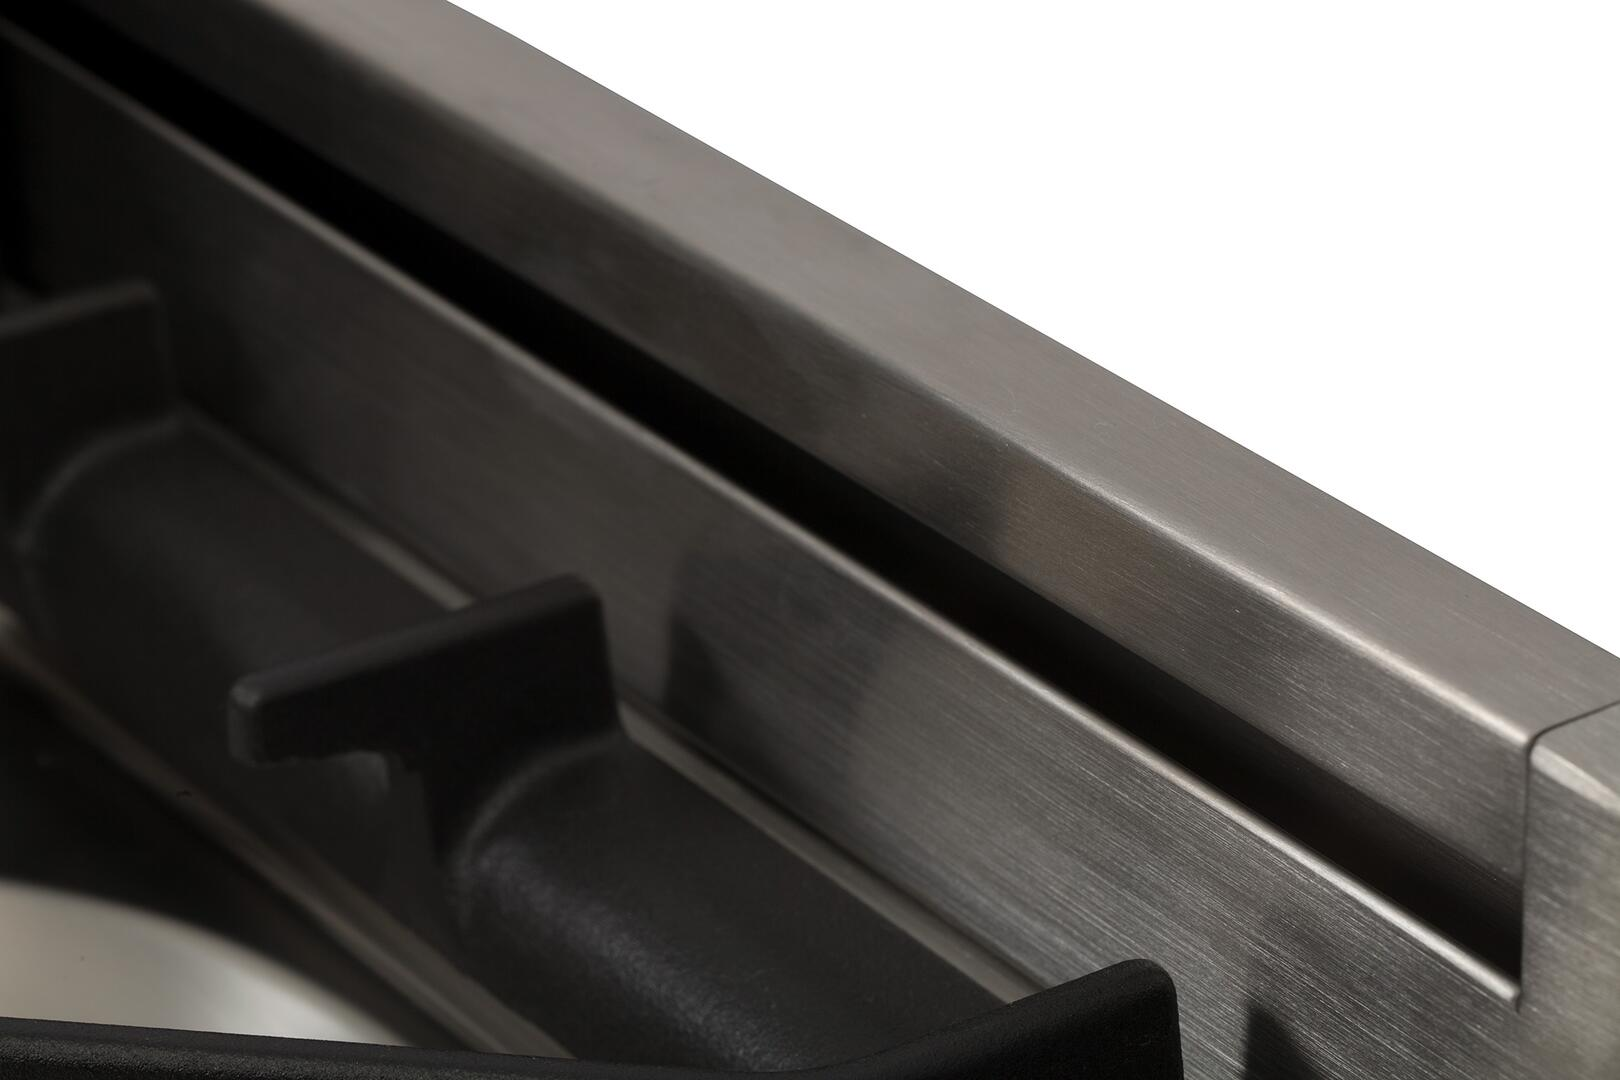 Ilve Nostalgie UPDN100FDMPNLP Freestanding Dual Fuel Range Black, 33